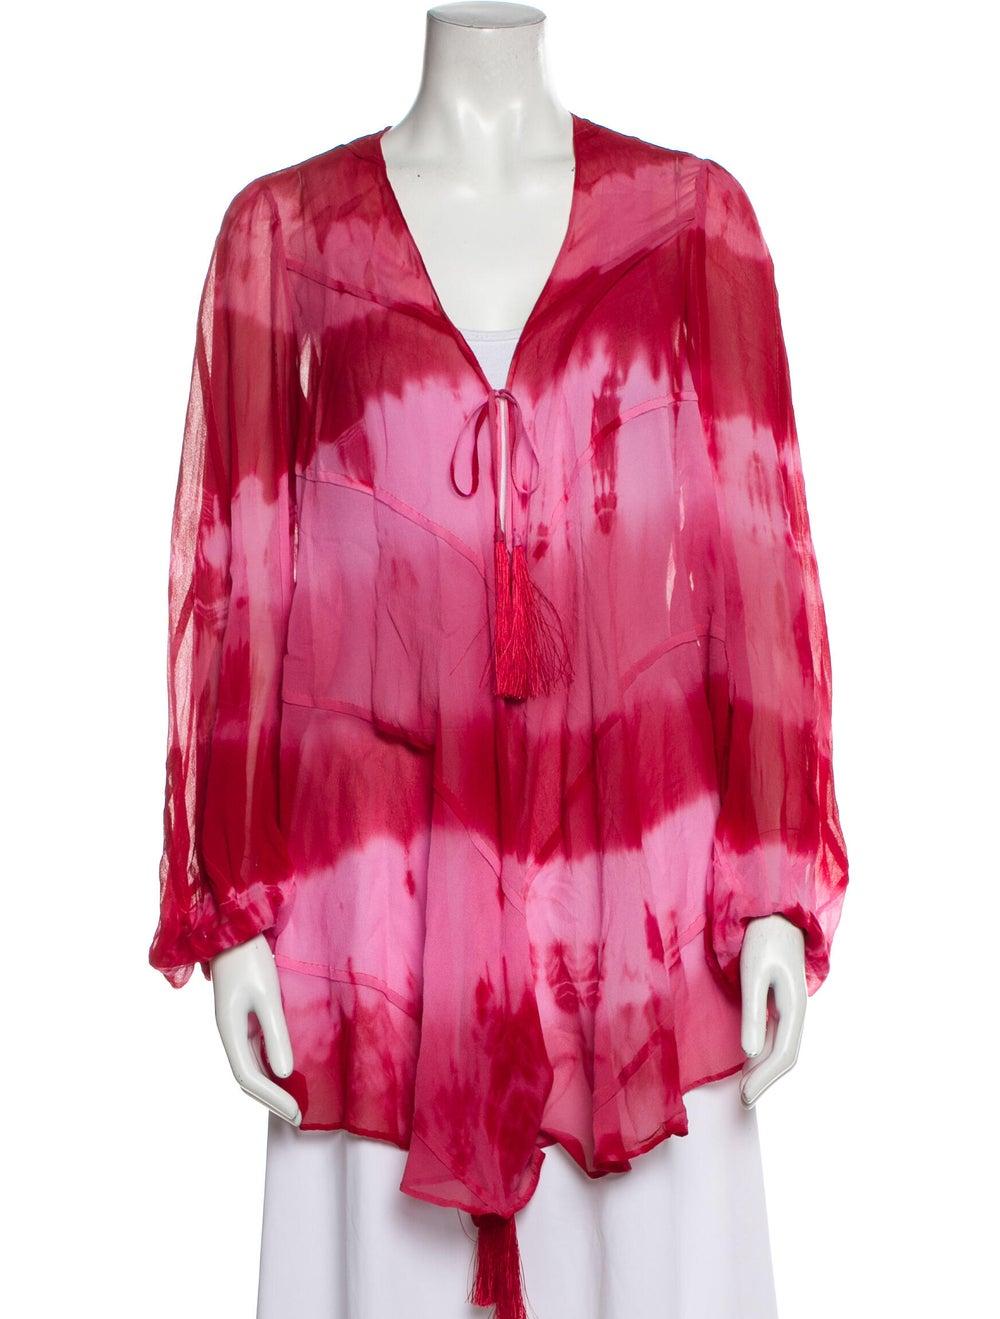 Haute Hippie Silk Tie-Dye Print Sweater Red - image 1